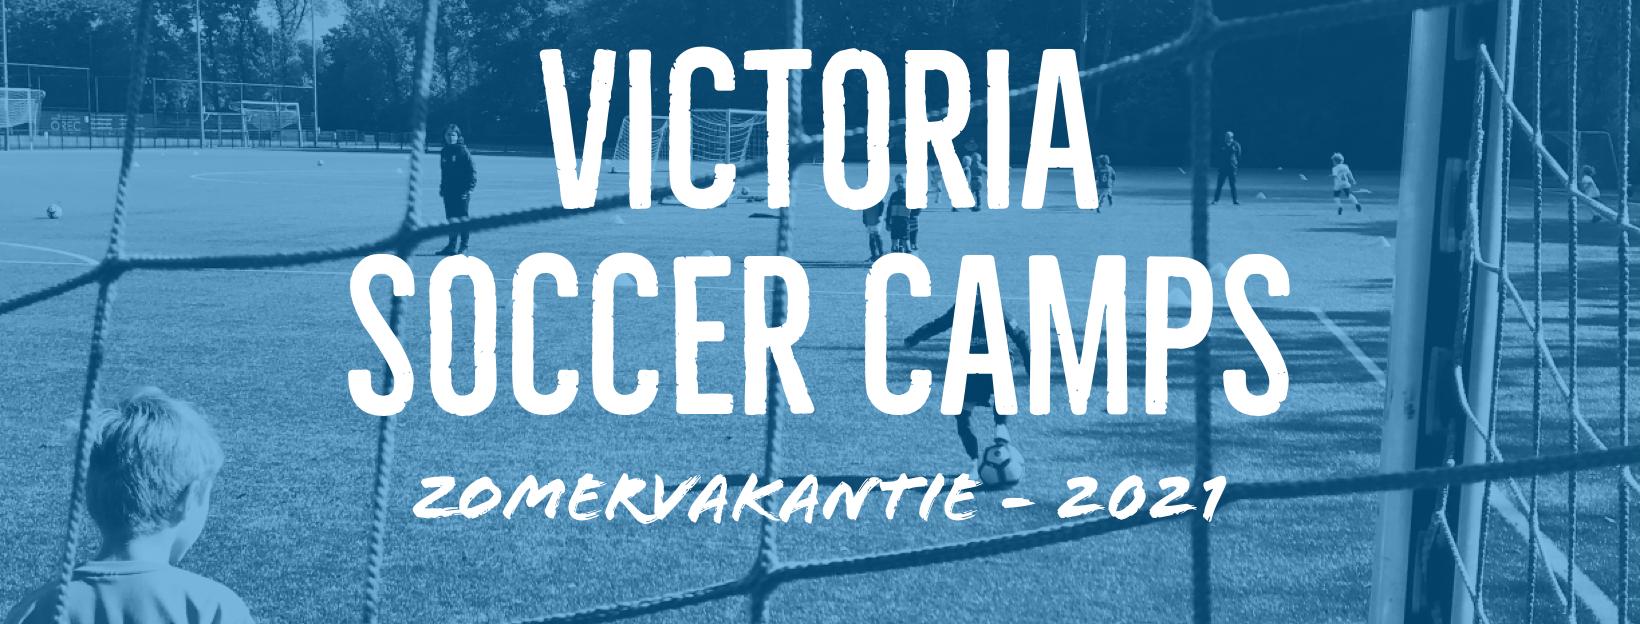 Soccercamps 2021